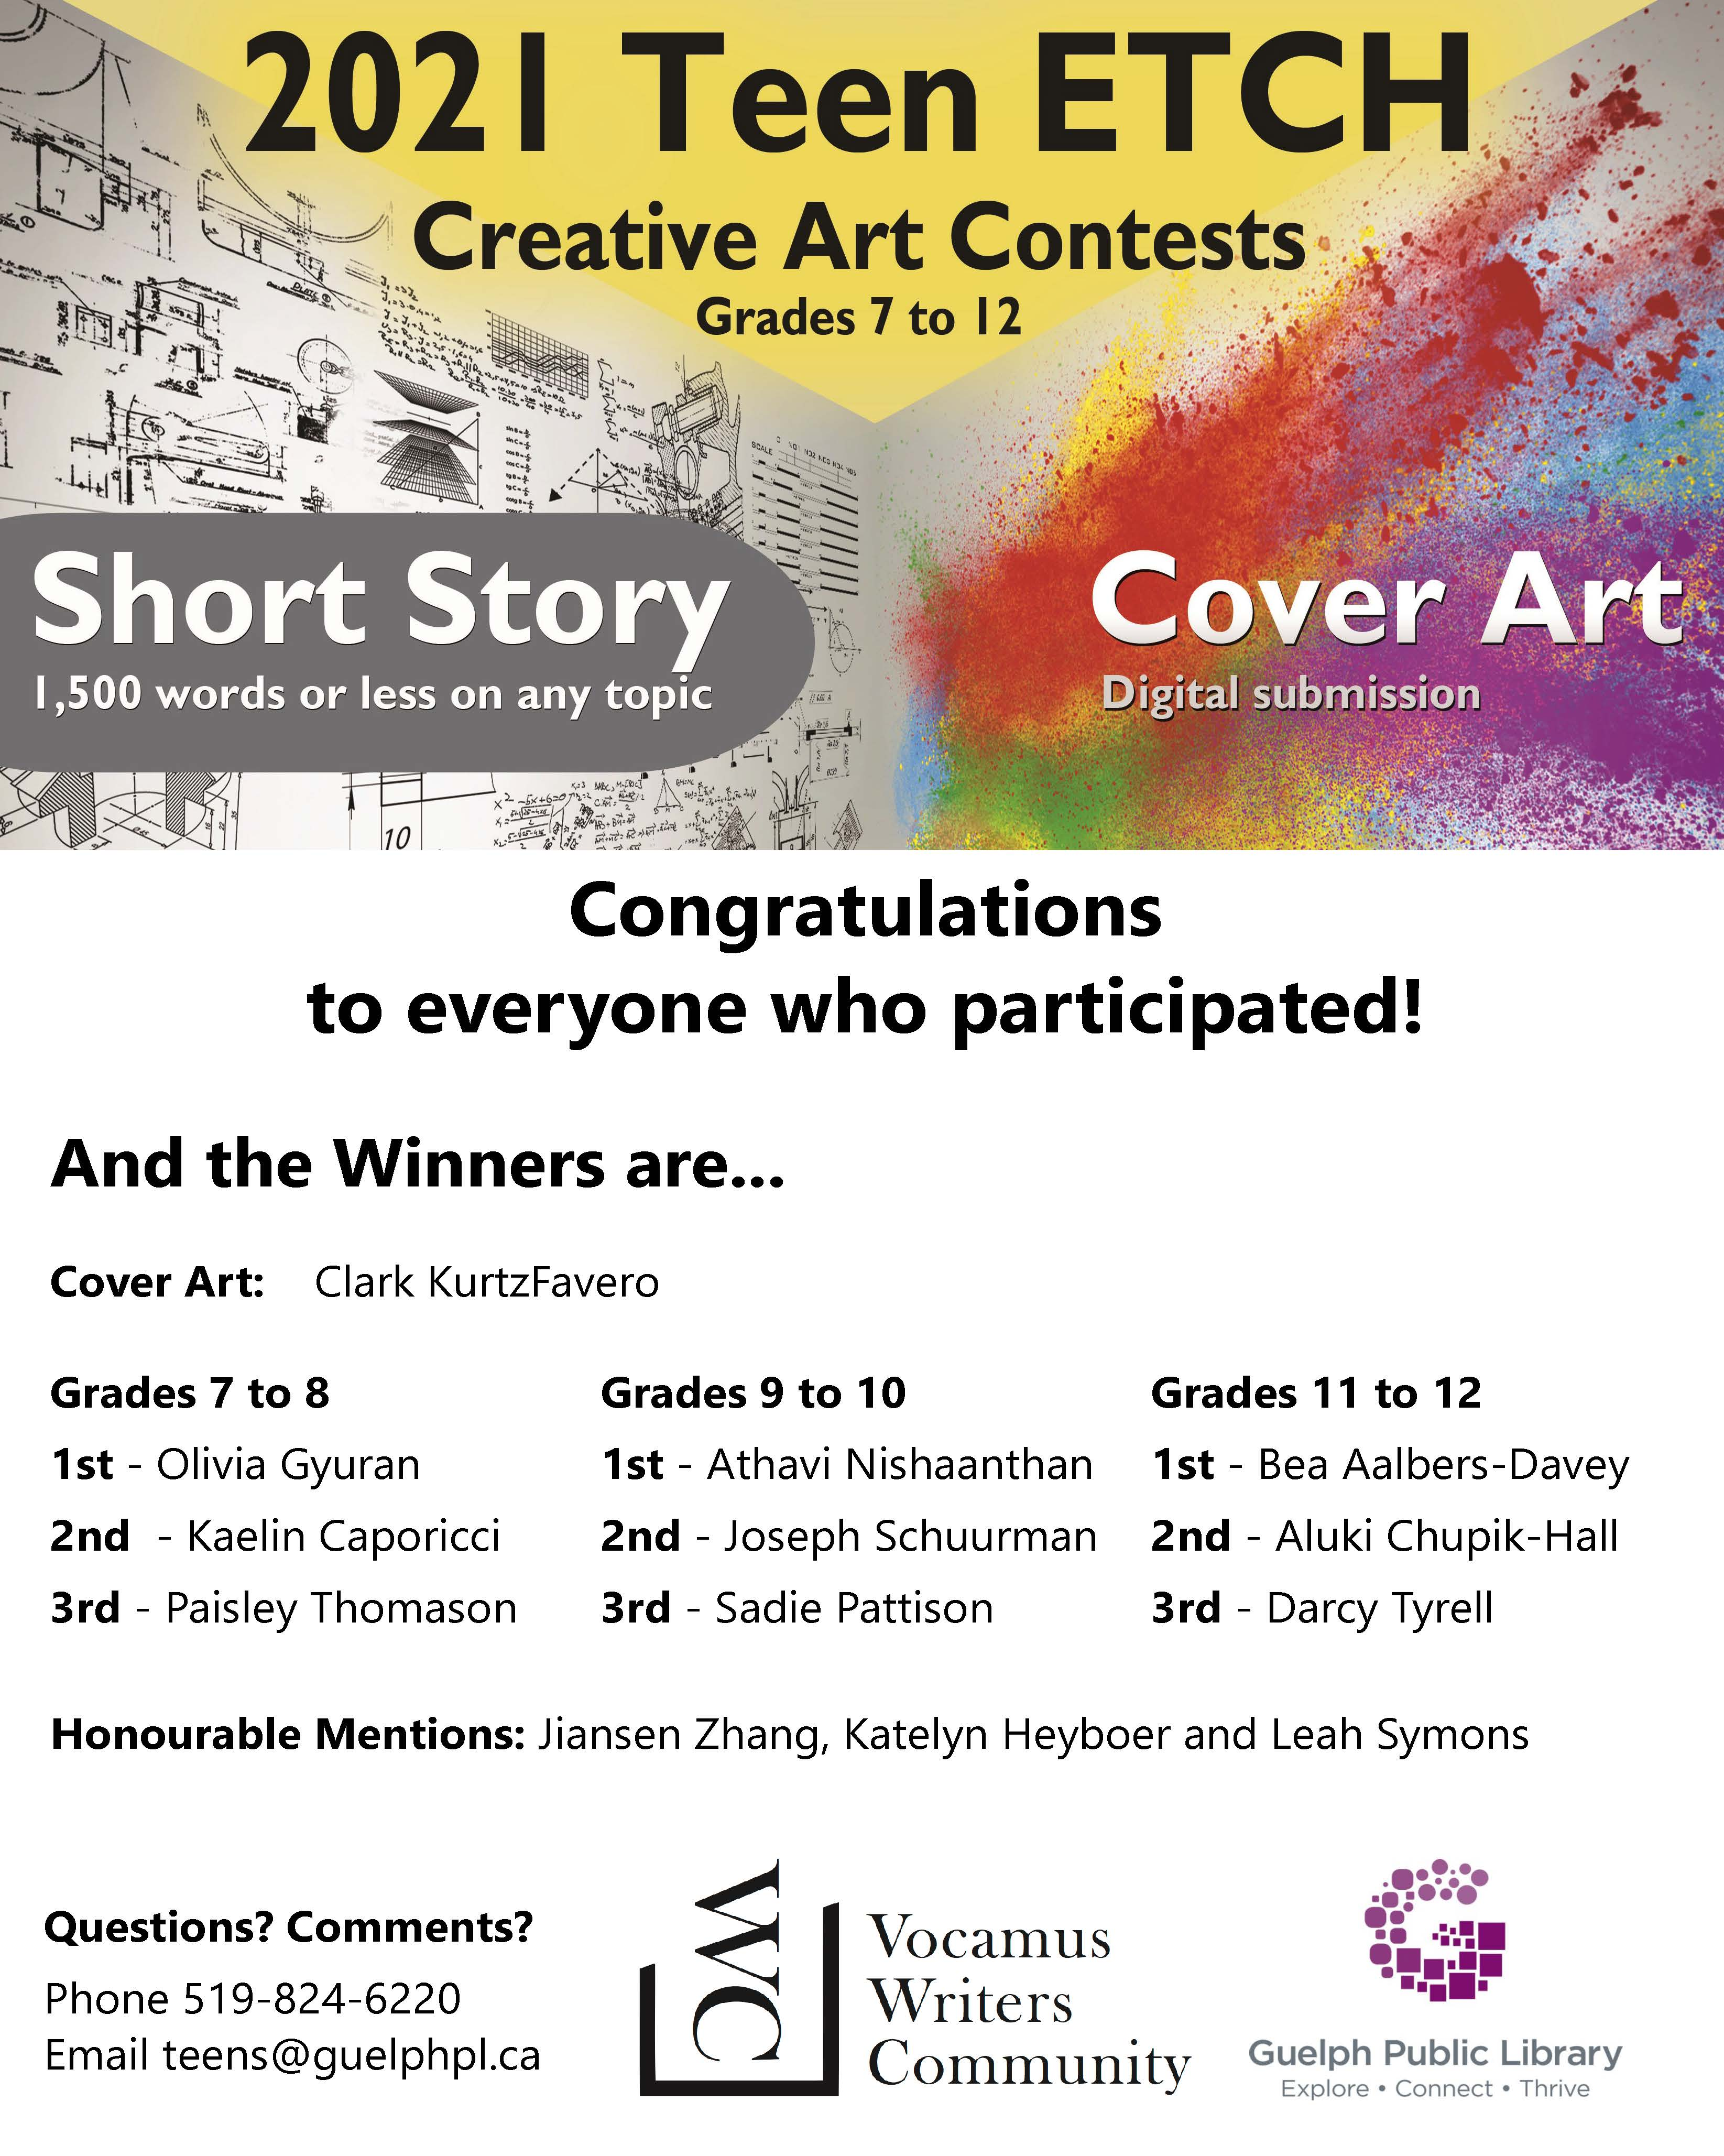 2021 Teen ETCH Creative Arts Contest Winners